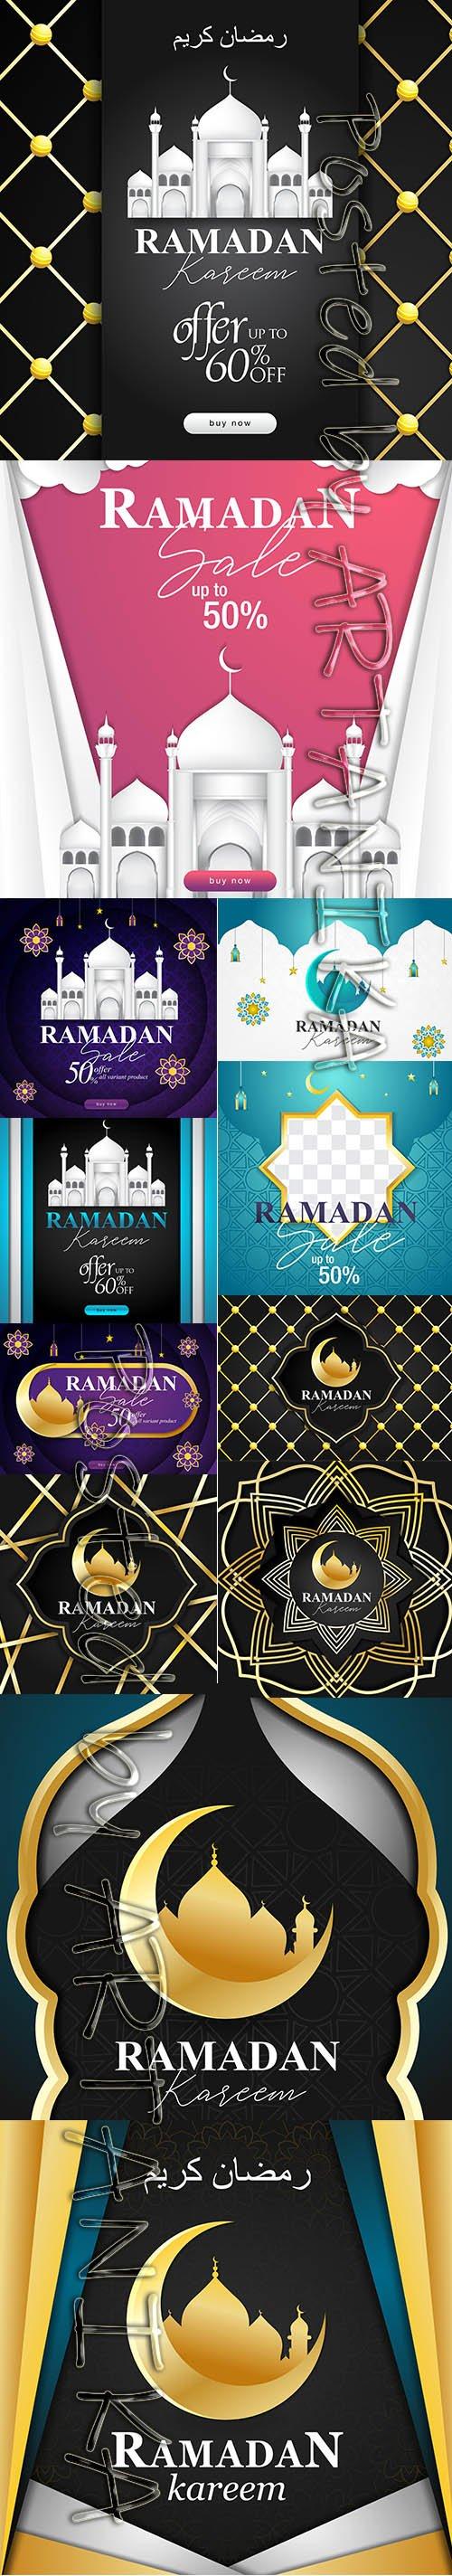 Vector Set of Modern Design Ramadan Kareem Event Backgrounds